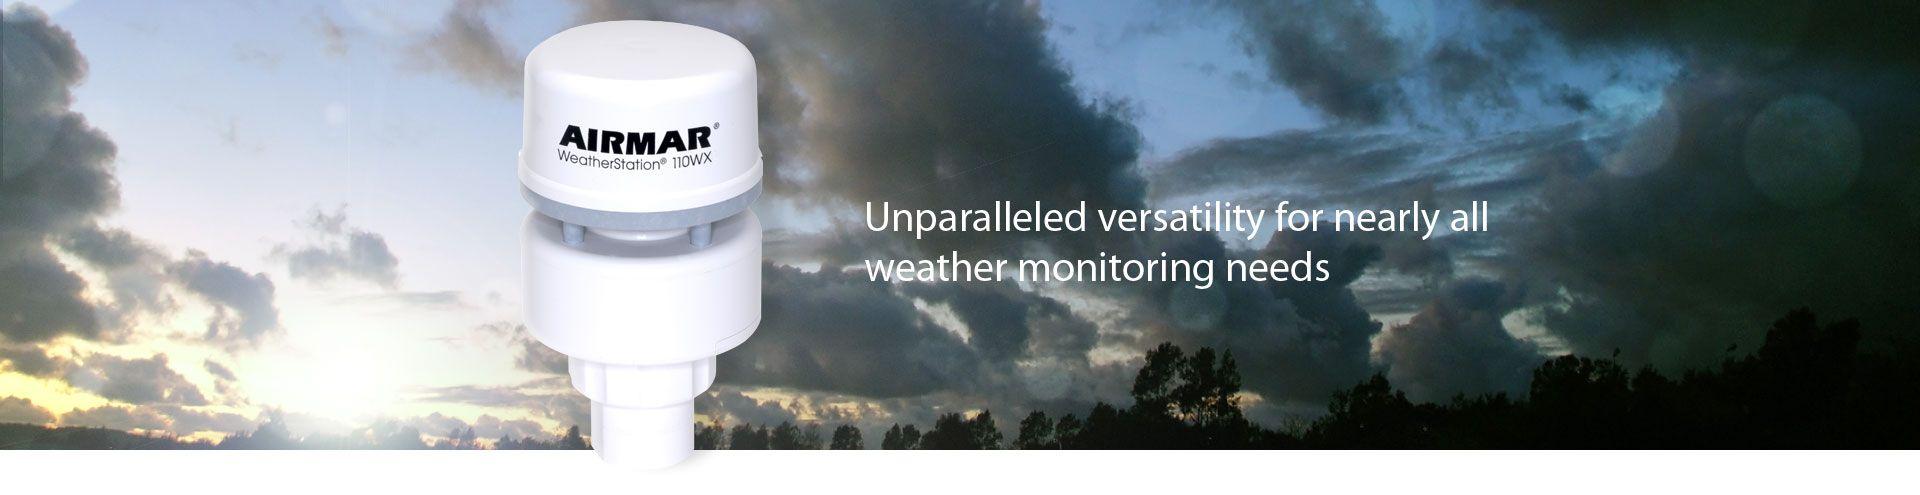 Airmar 110WX Ultrasonic WeatherStation Instrument